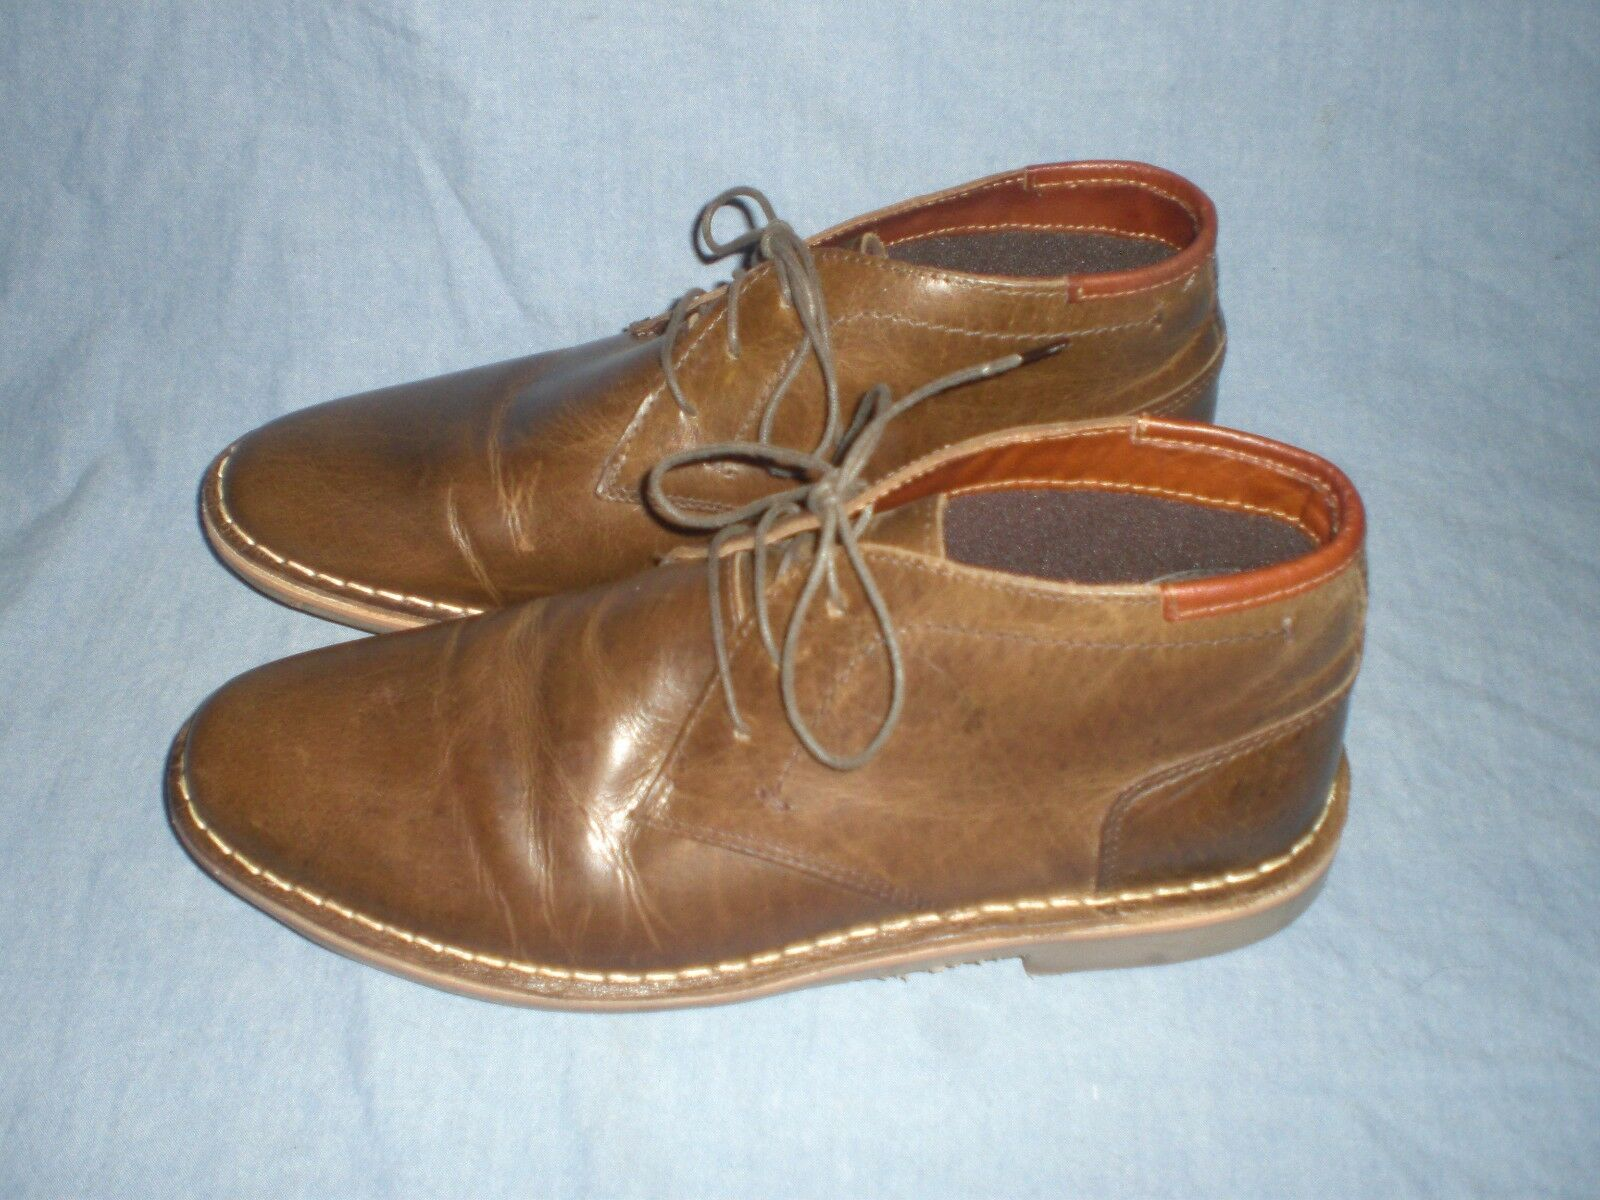 Steve Madden Men's Harken Chukka Boots Ankle Boots  Leather SIZE 9